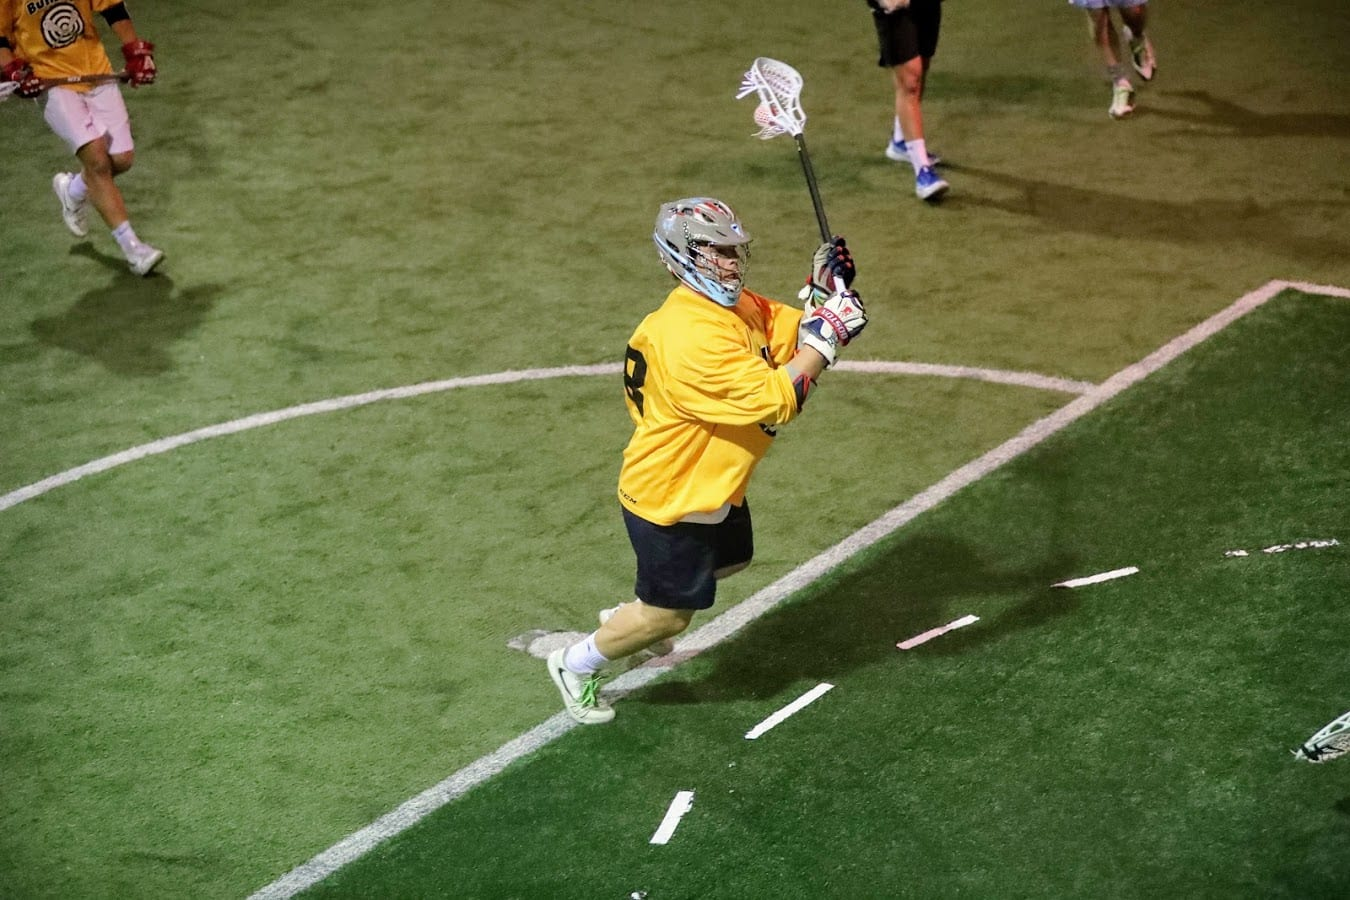 boston box lacrosse league bbll john uppgren